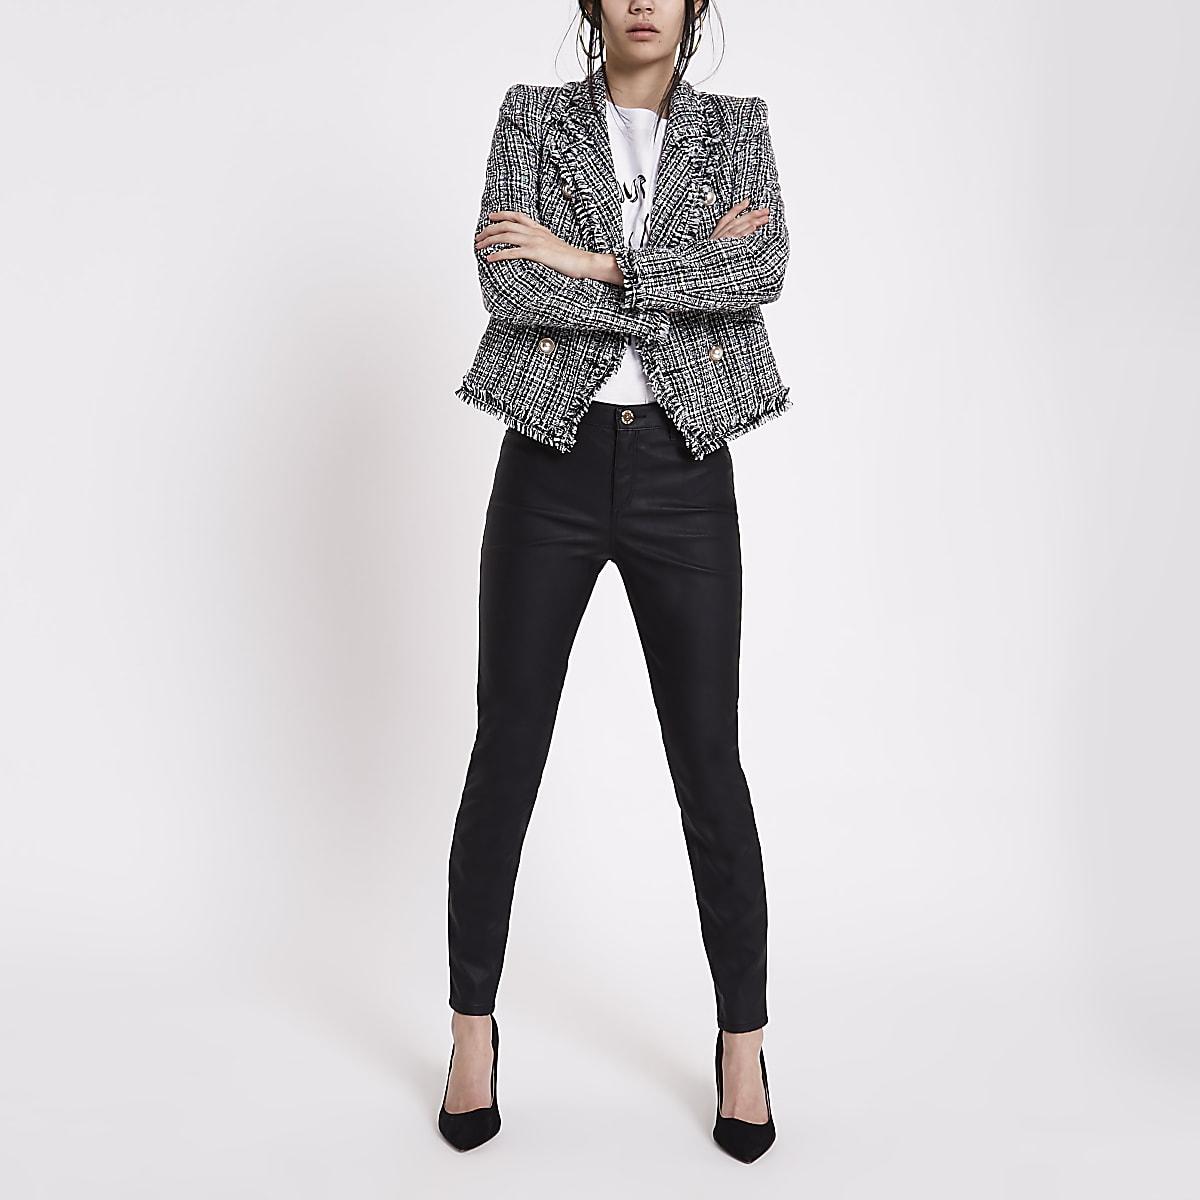 332facb102eb89 Molly – Schwarze Skinny Fit Hose aus Lederimitat - Skinny Fit Hosen ...